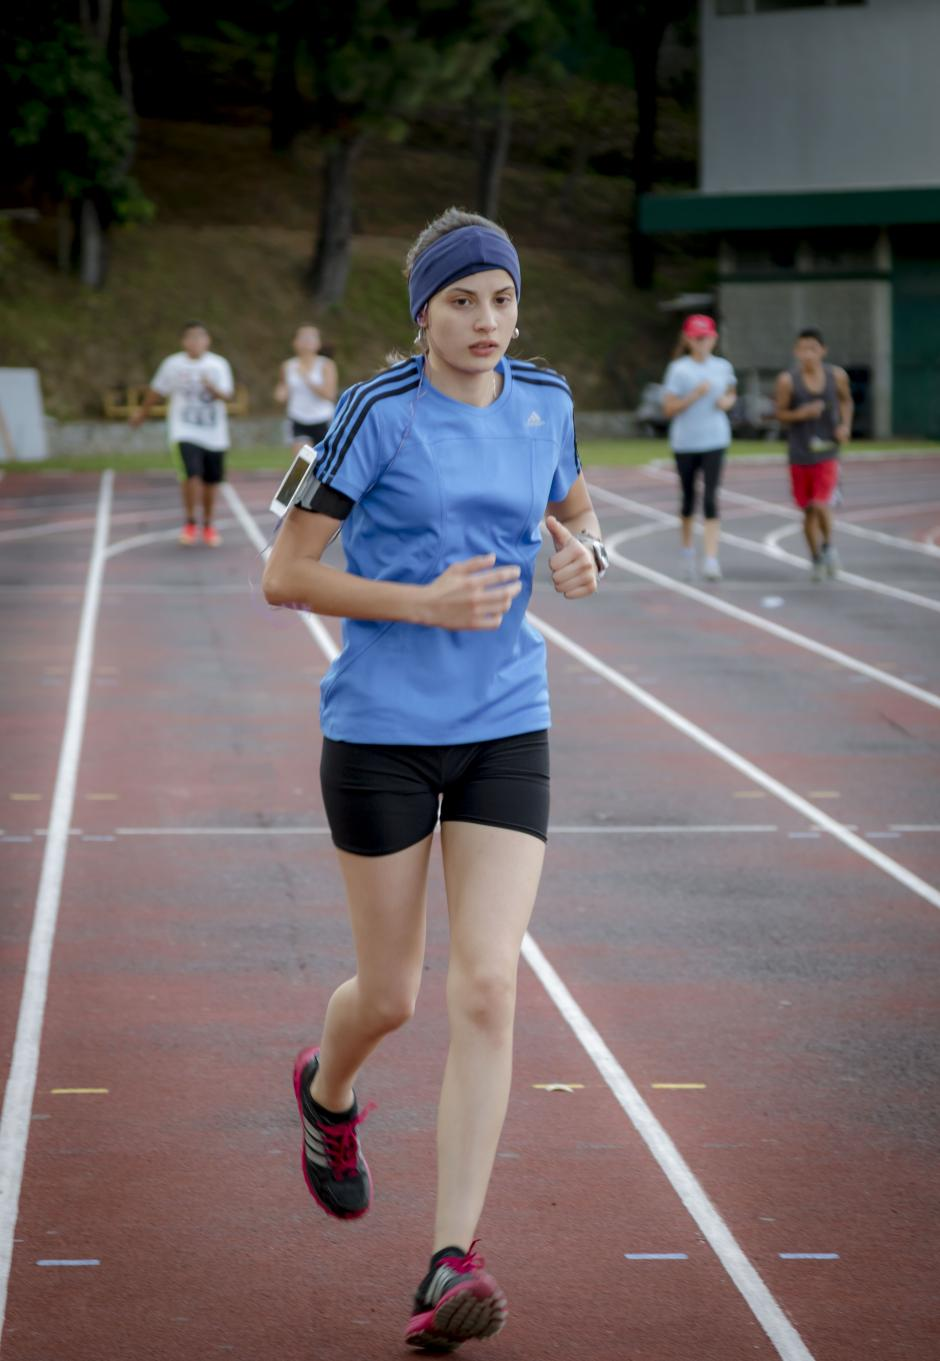 Las clases de atletismo se dictan de lunes a viernes, de 15:30 a 17 horas. (Foto: Soy502)